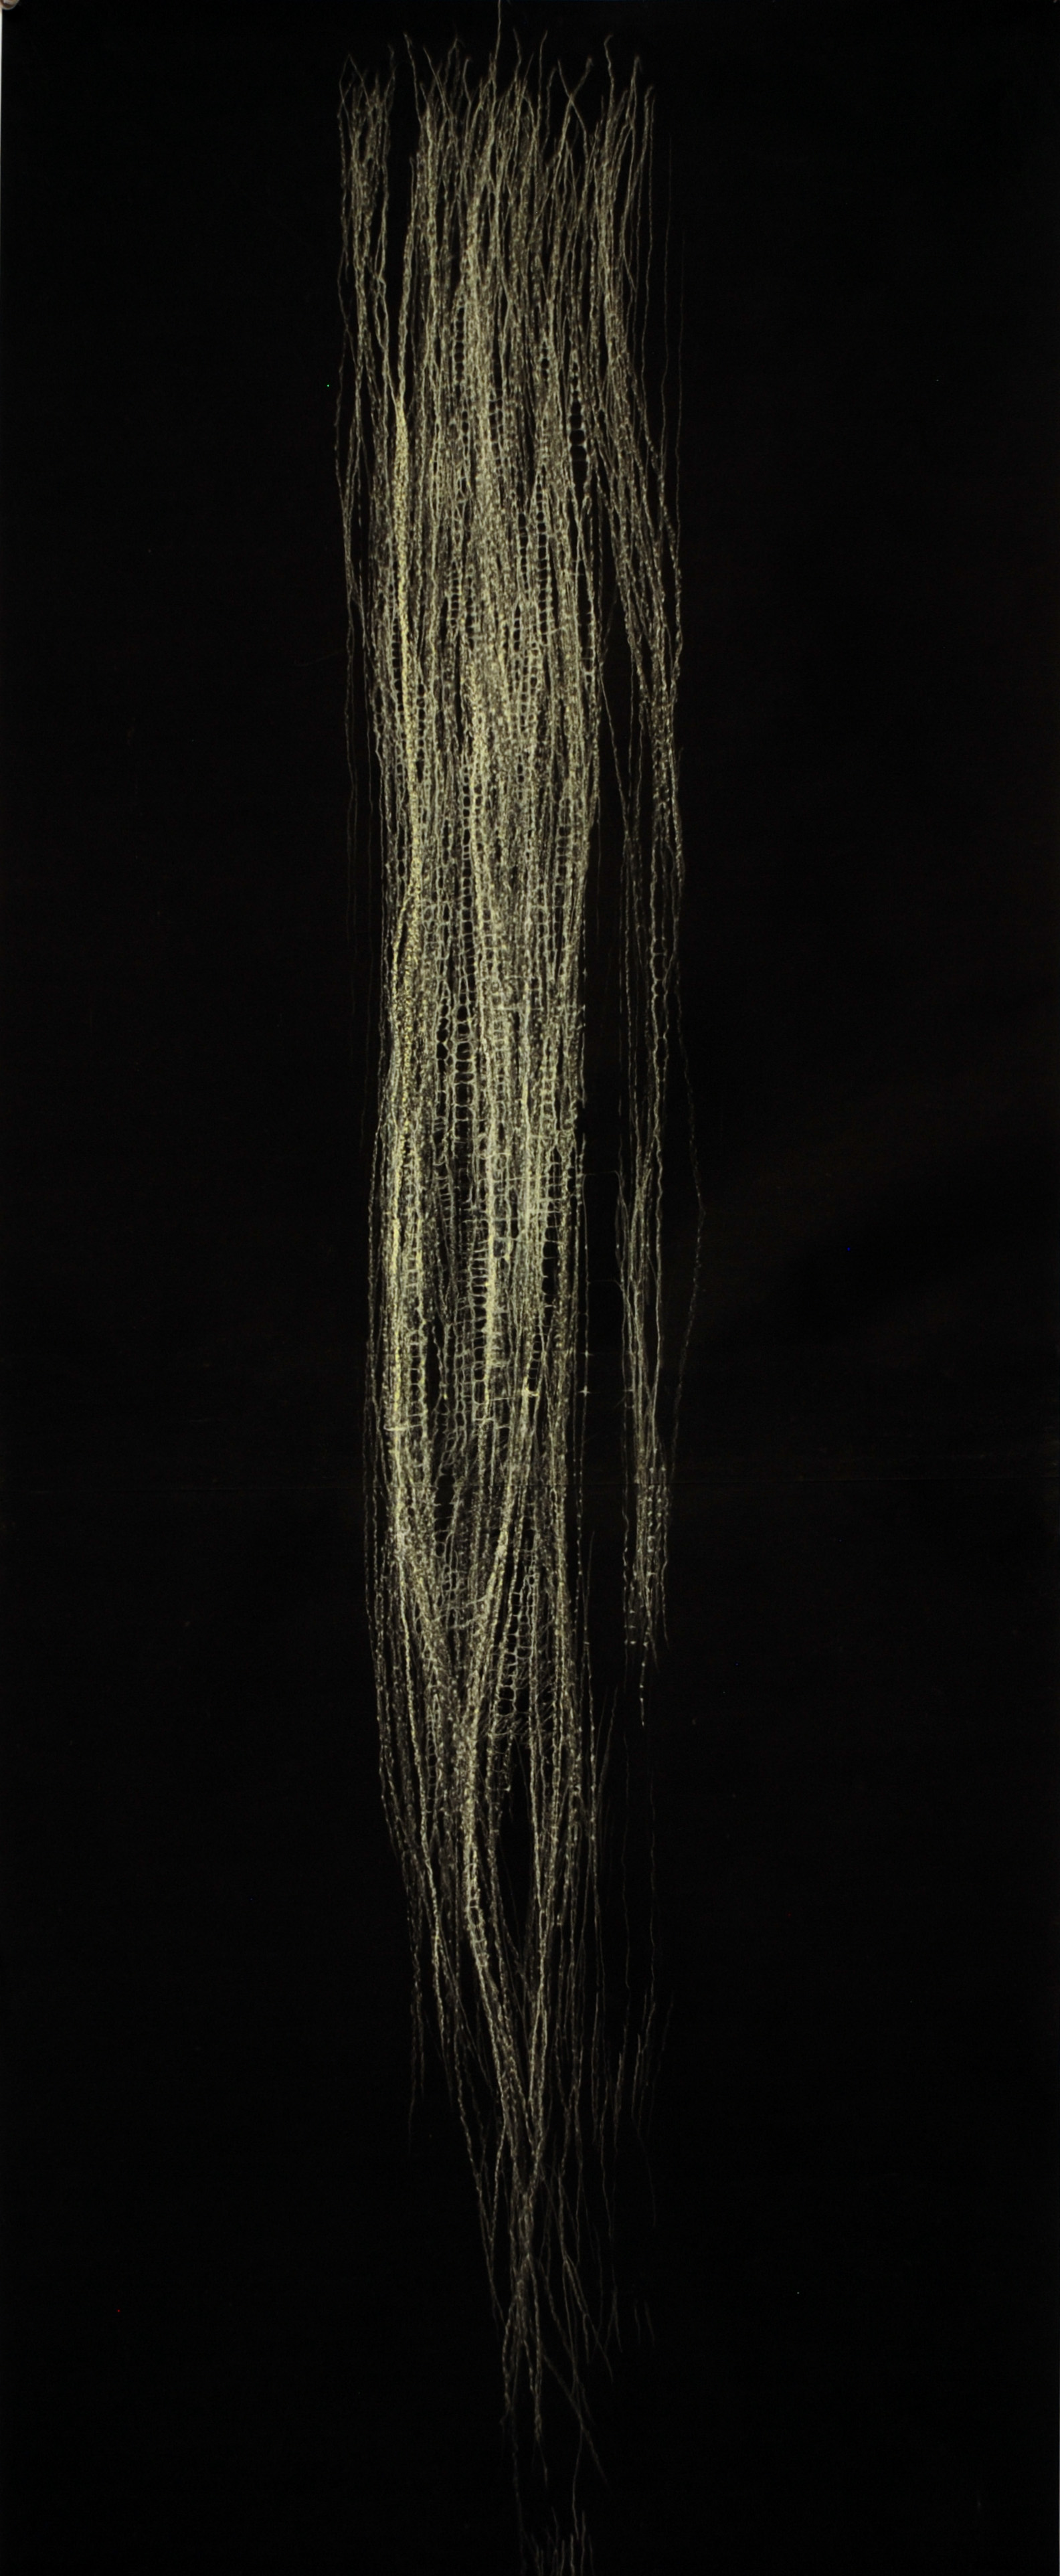 Lightfall,  2' x 6' Pencil on paper, 2012